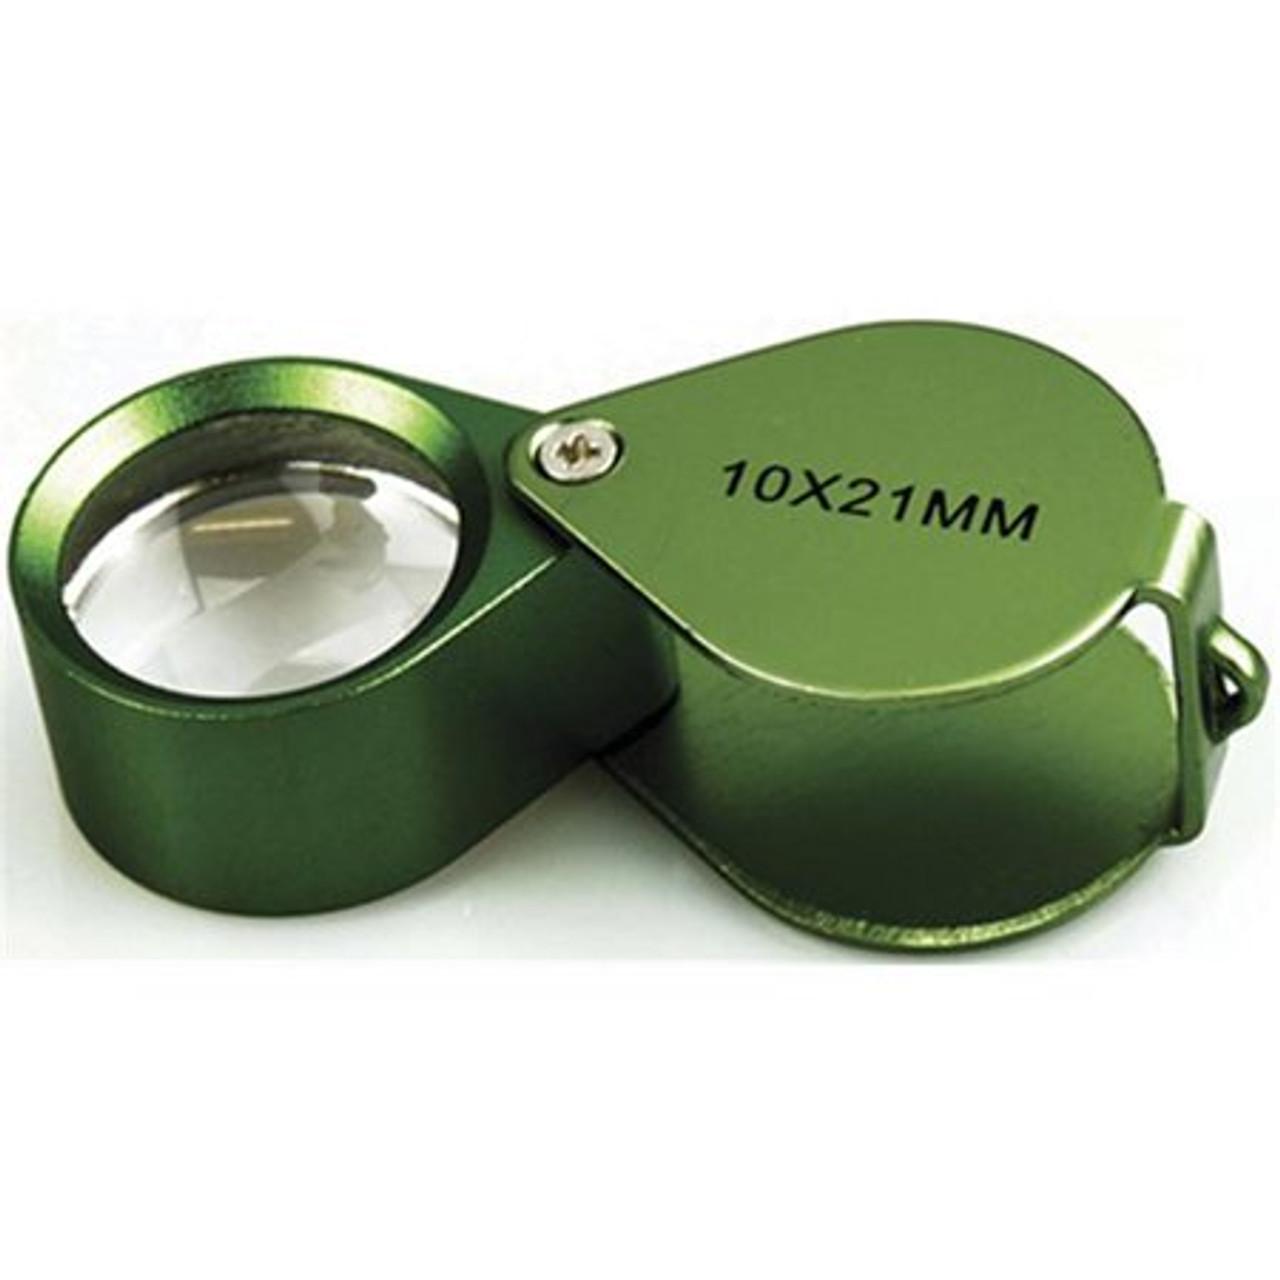 Green Goblin Metal Magnifier Loupe 10X 21mm Glass Lens (so-MK994-8GN)